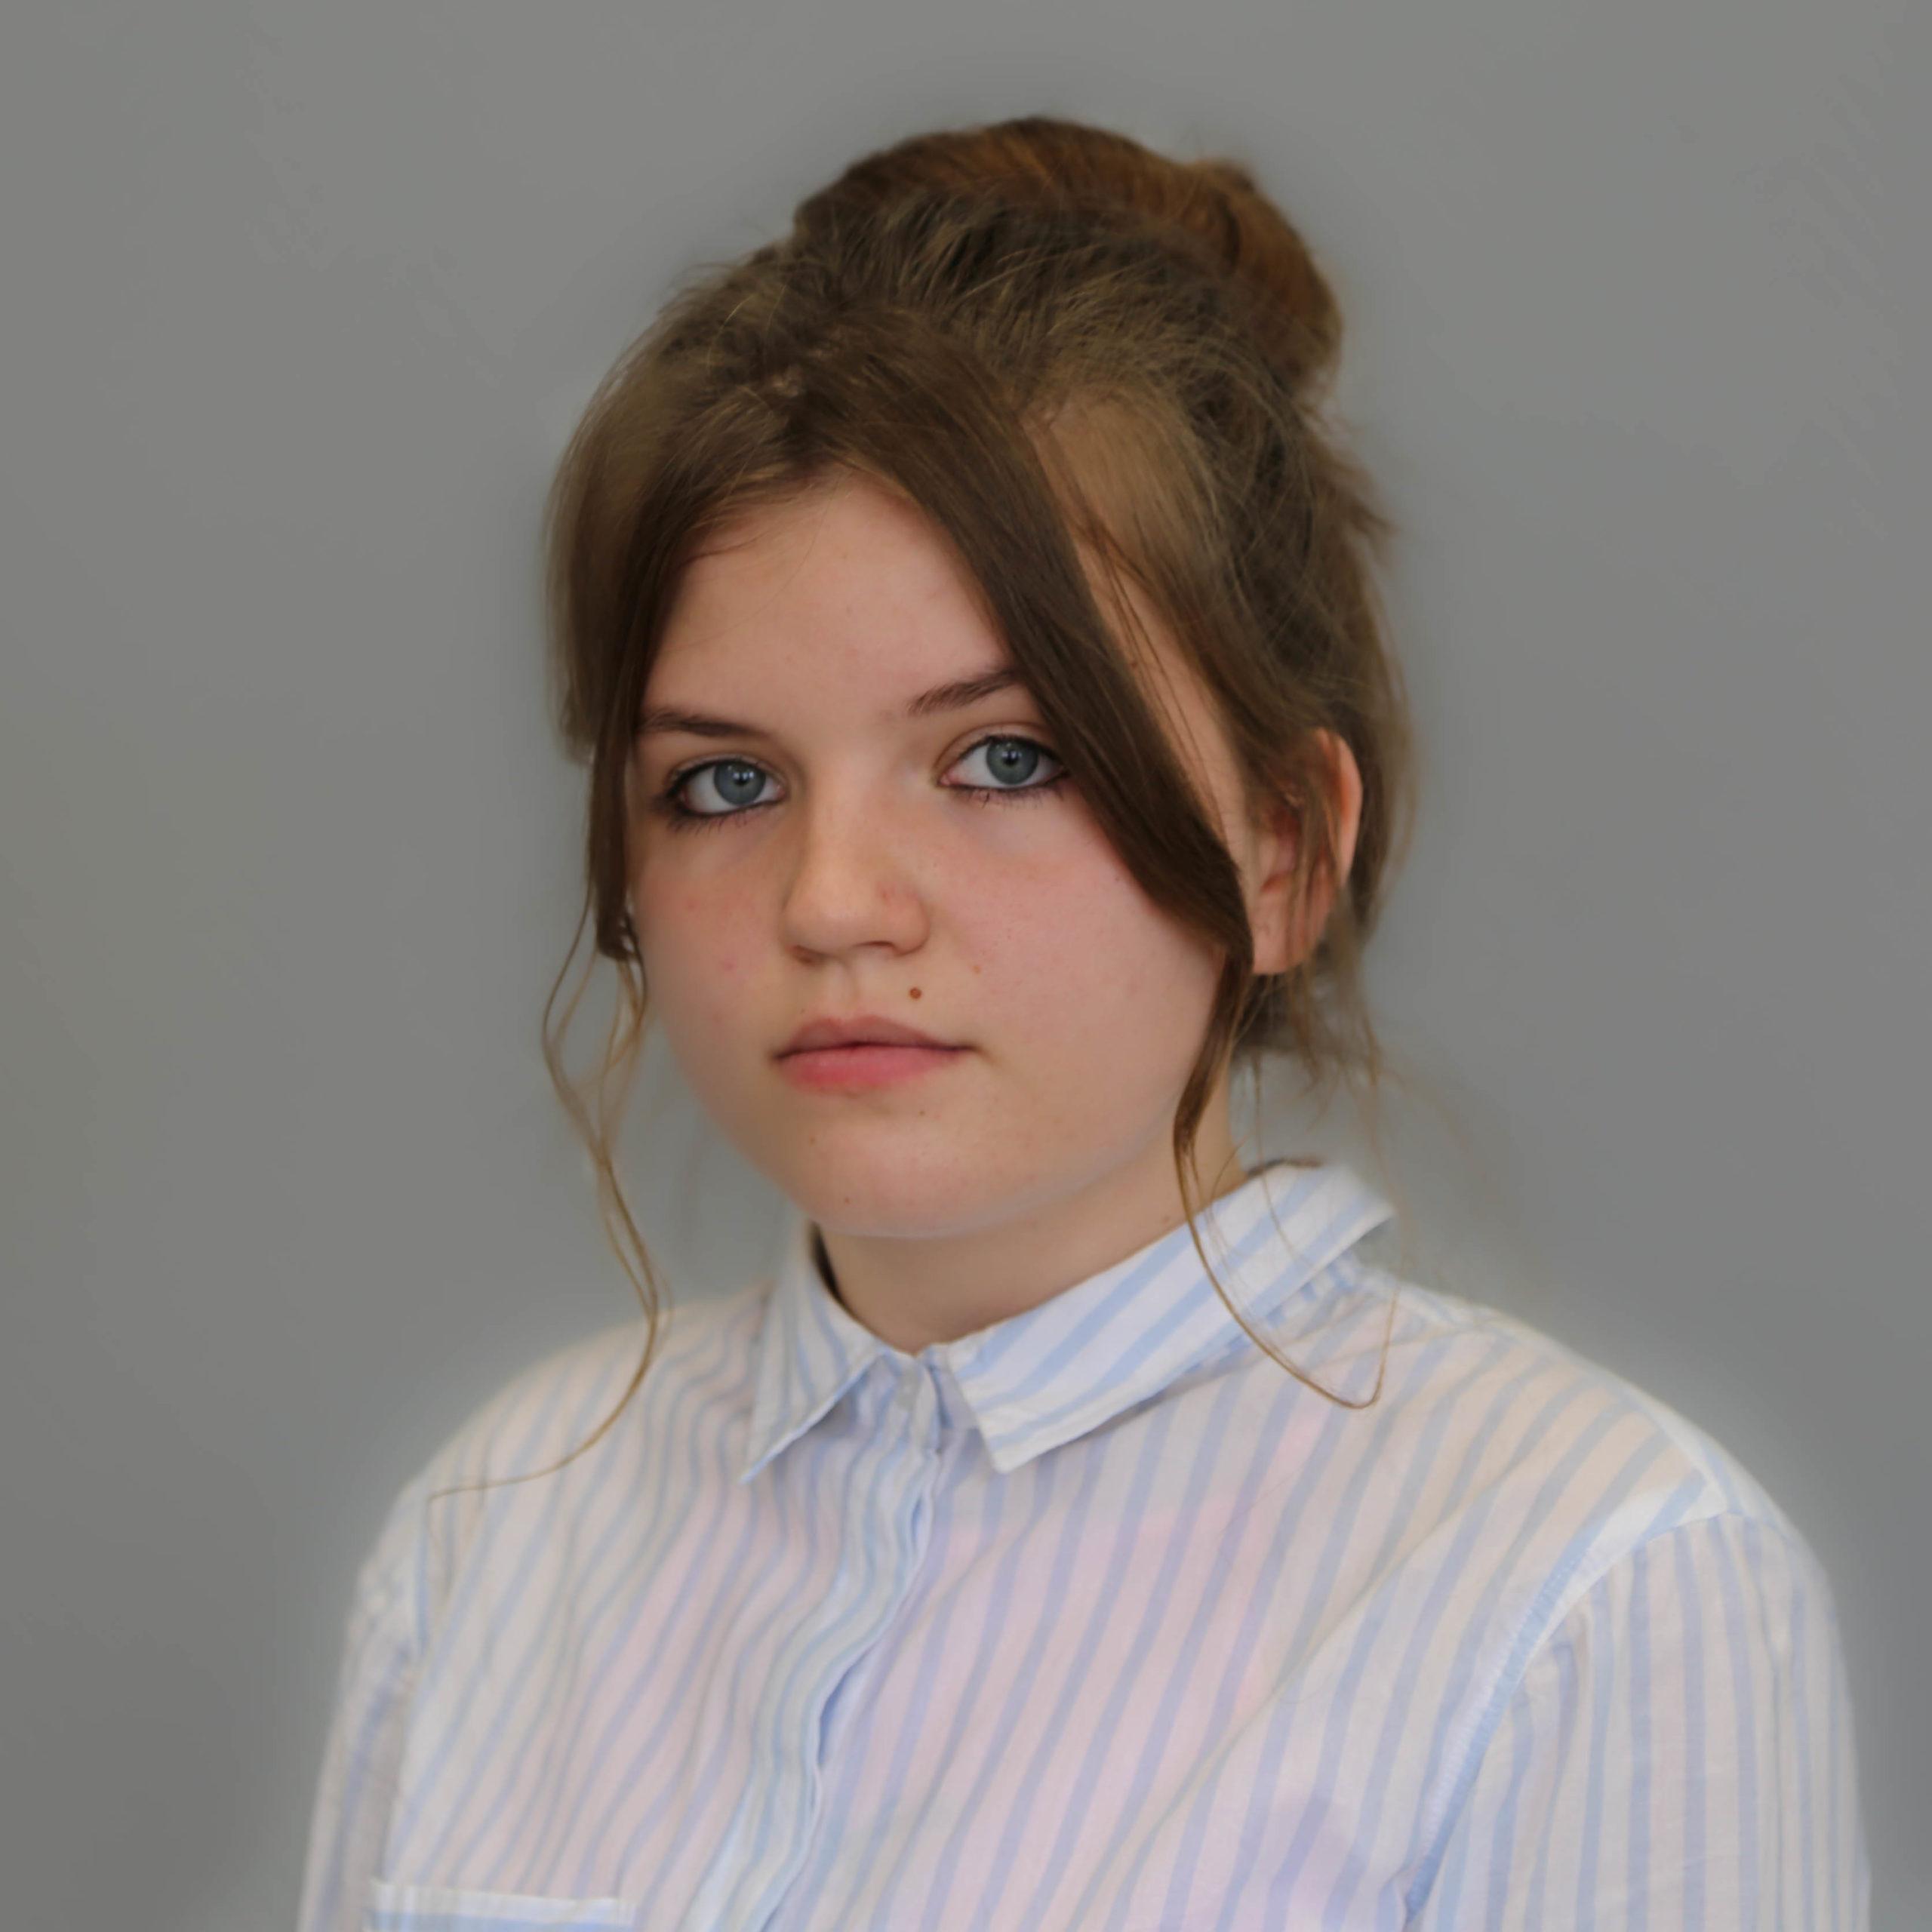 Ненашева Полина Олеговна